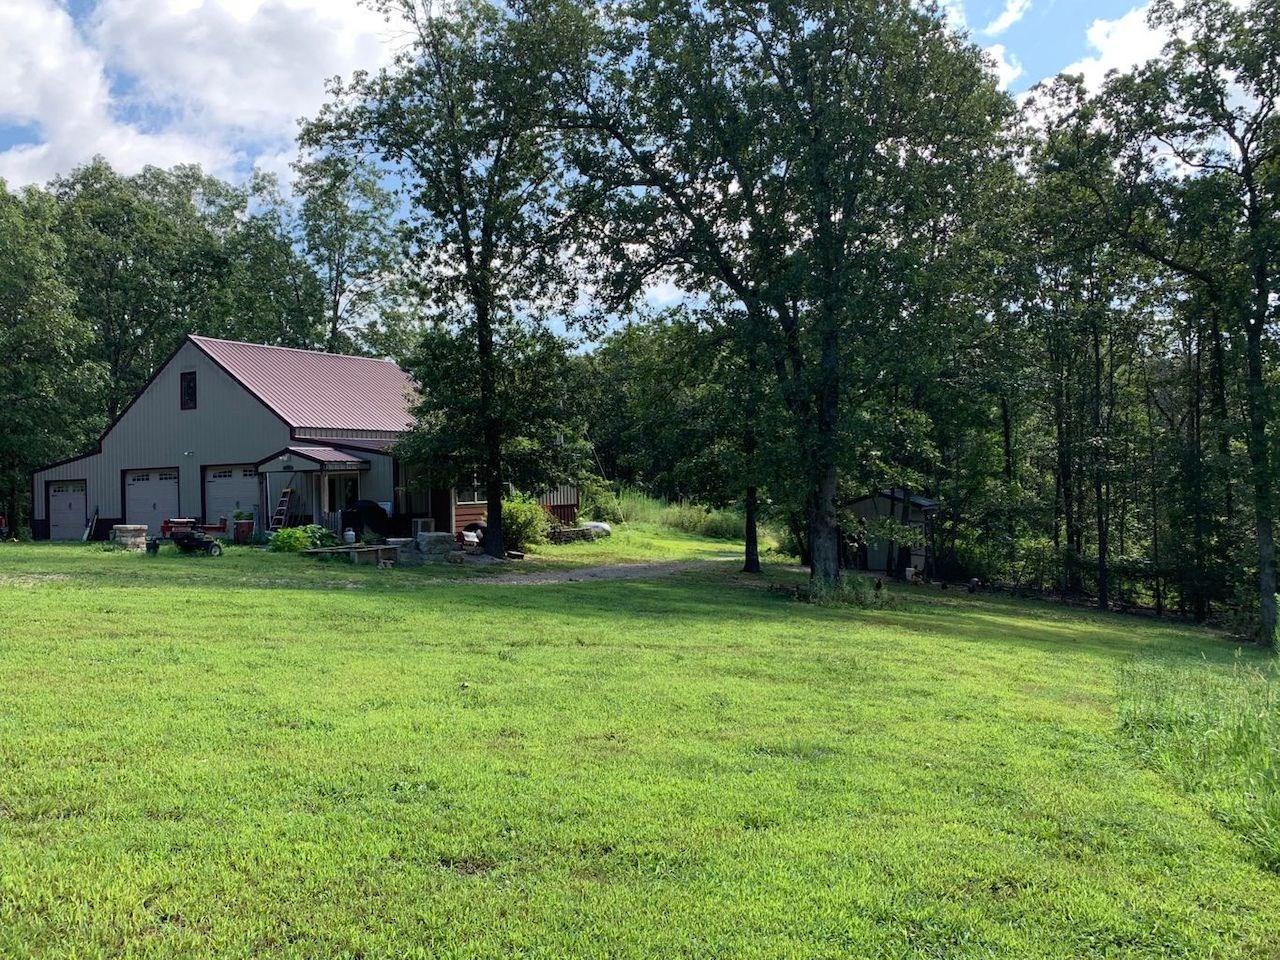 Farm with Barndominium for Sale - Southern Missouri Ozarks